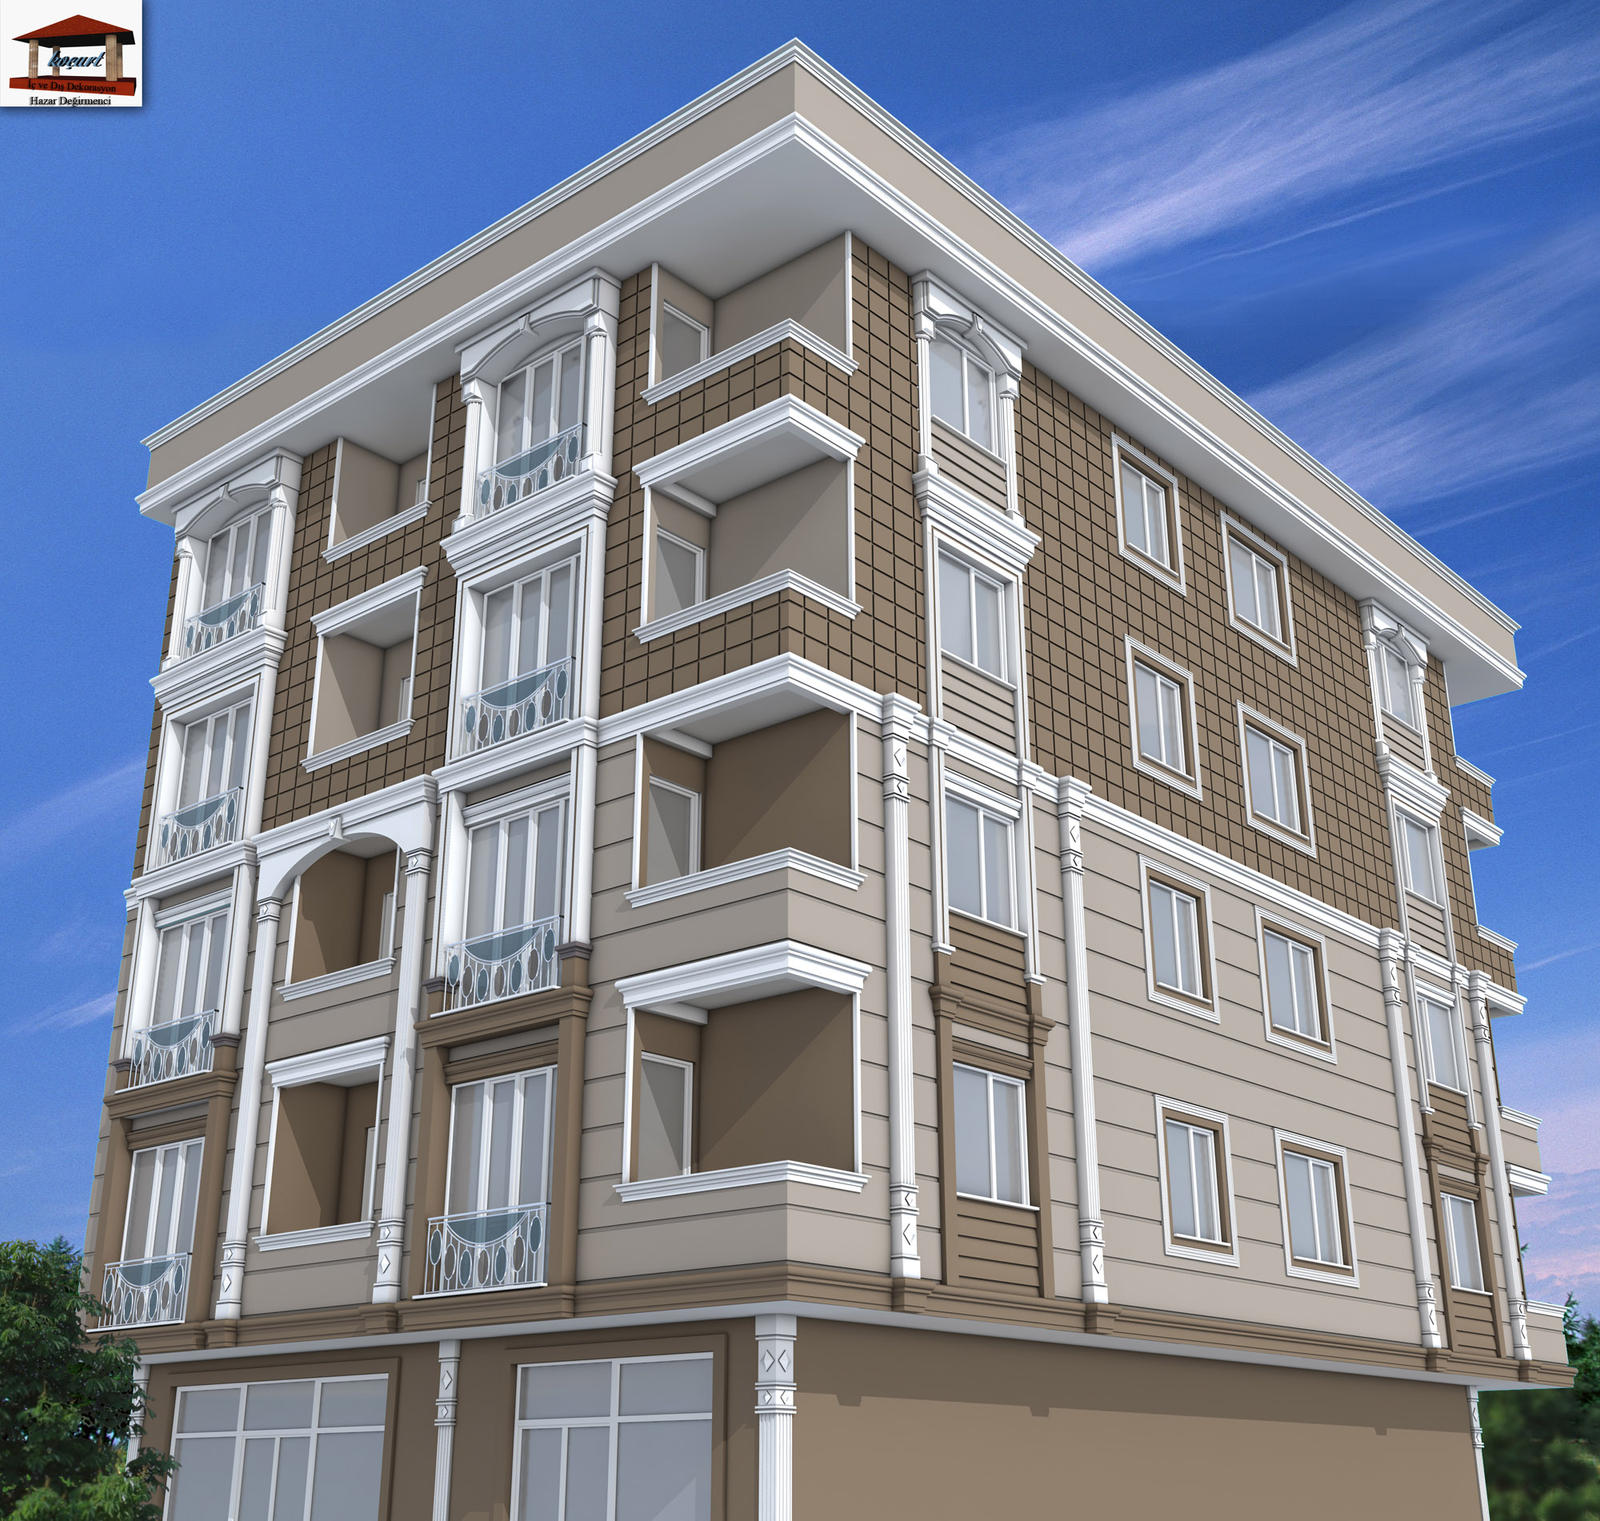 Perfect ... Building Design 01 01 By FeanorRauko